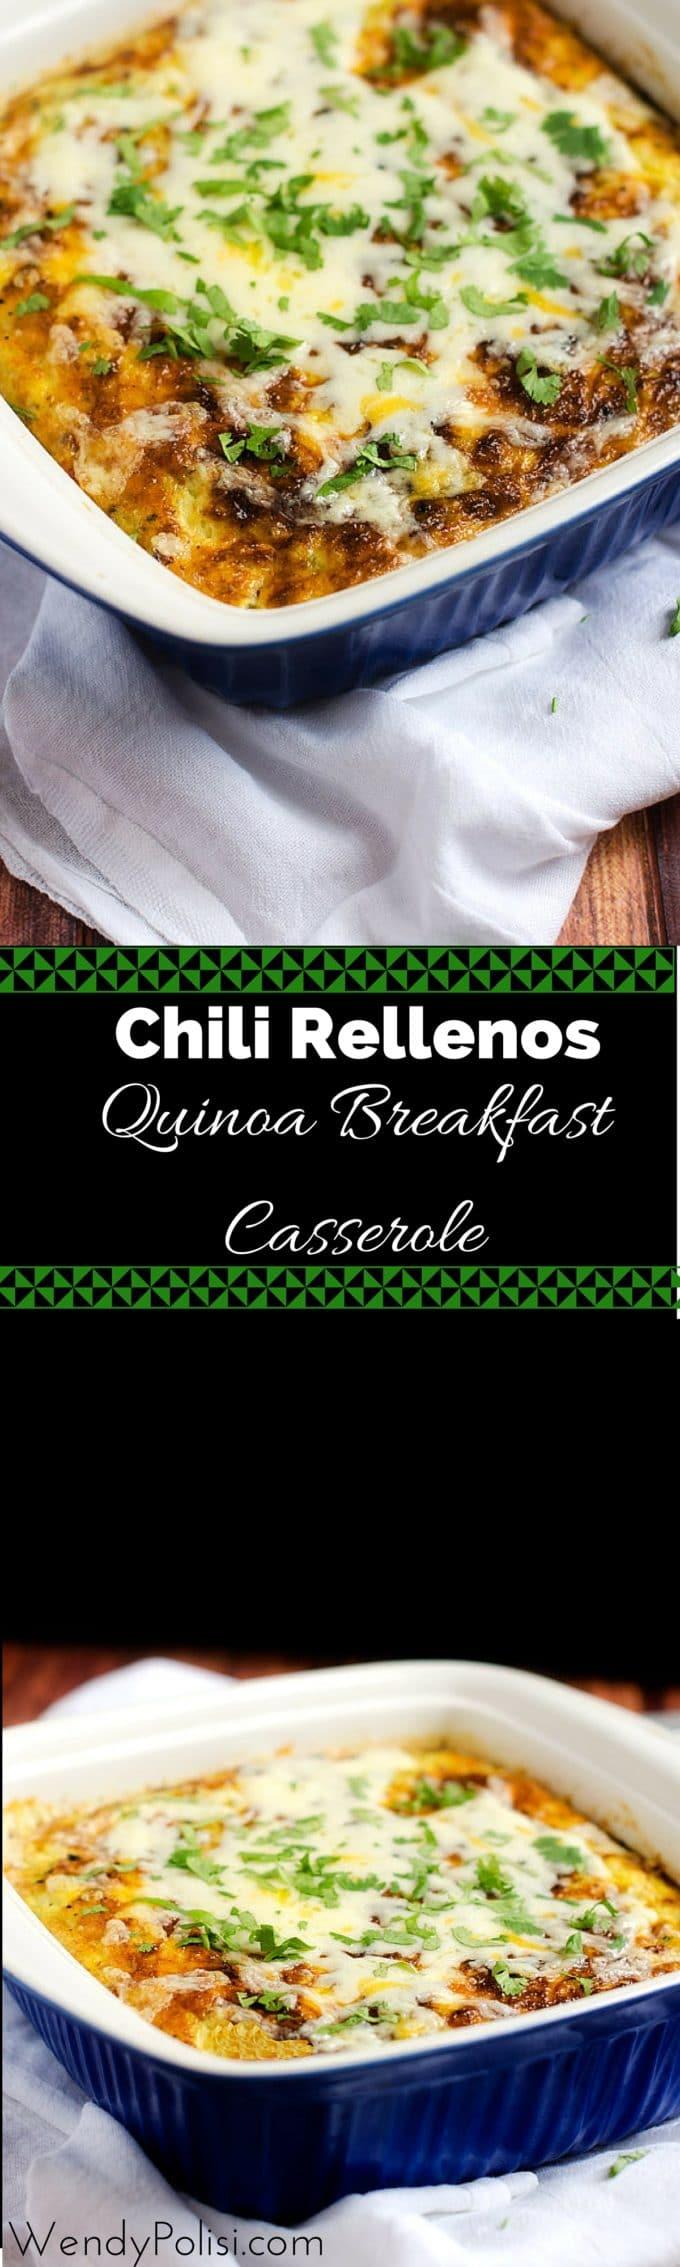 chili rellenos breakfast